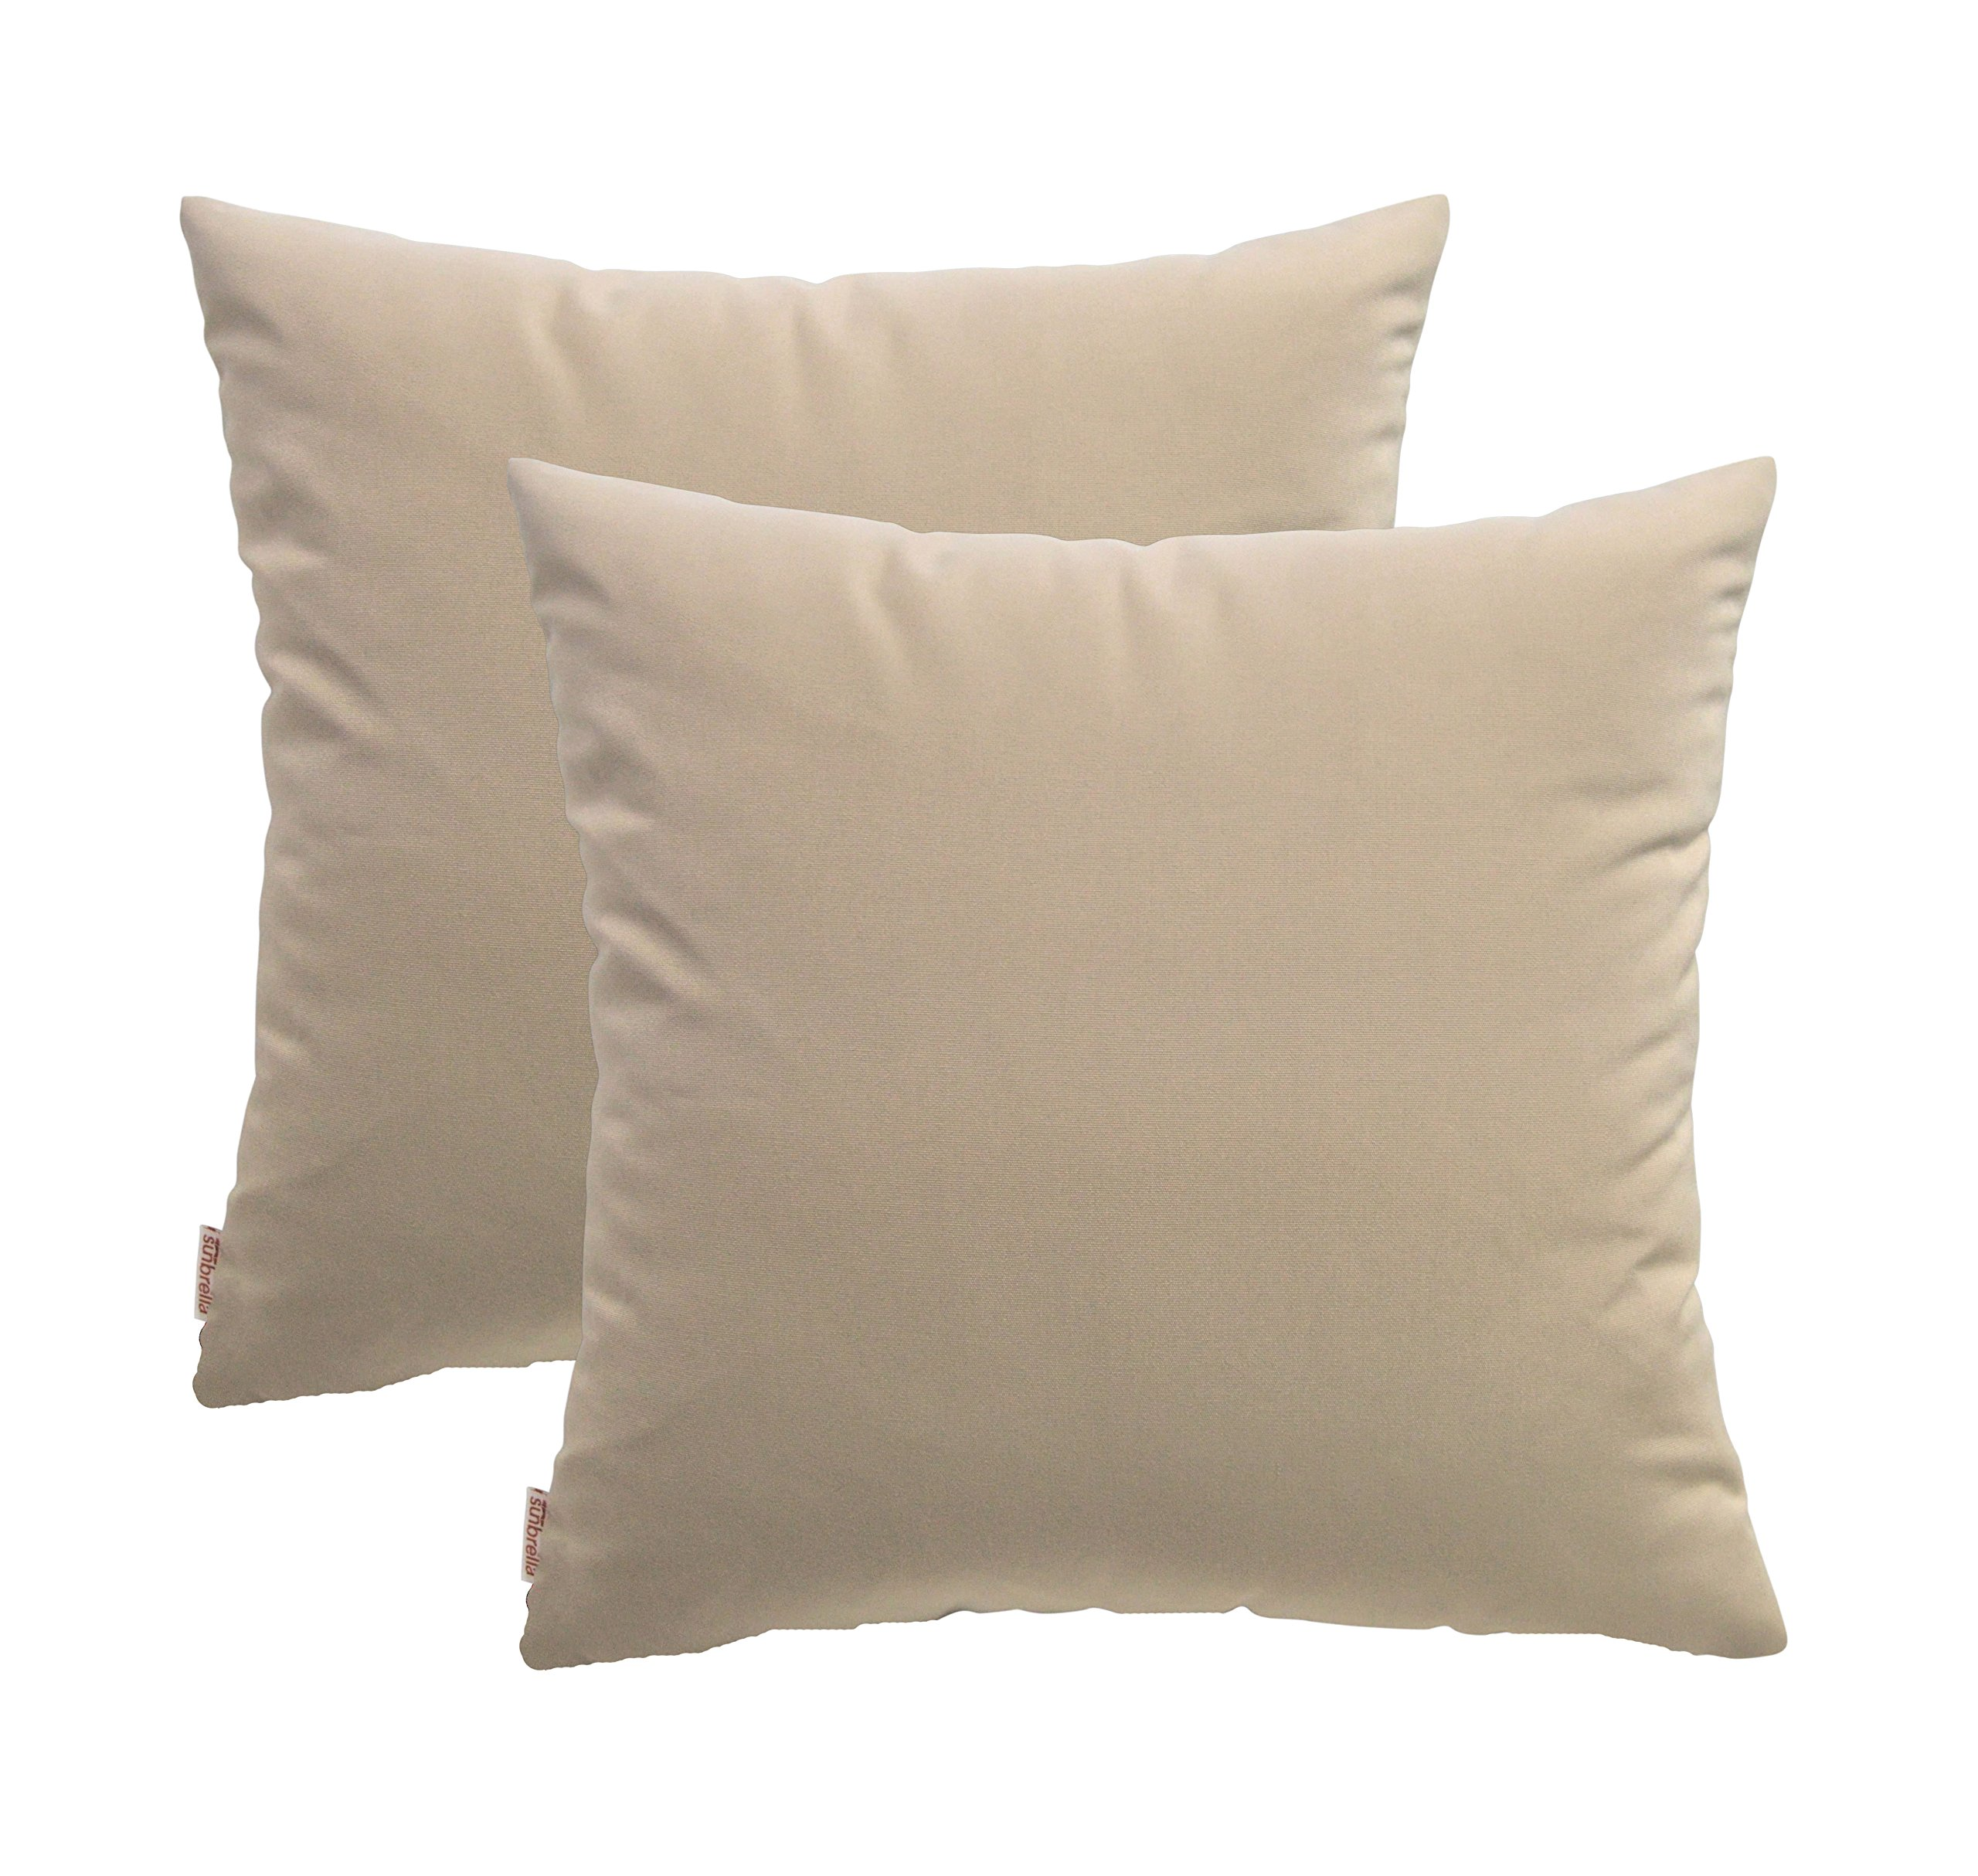 RSH Décor Set of 2 Indoor/Outdoor Decorative Throw Pillows Sunbrella Canvas Canvas Beige/Tan - 24'' x 24''